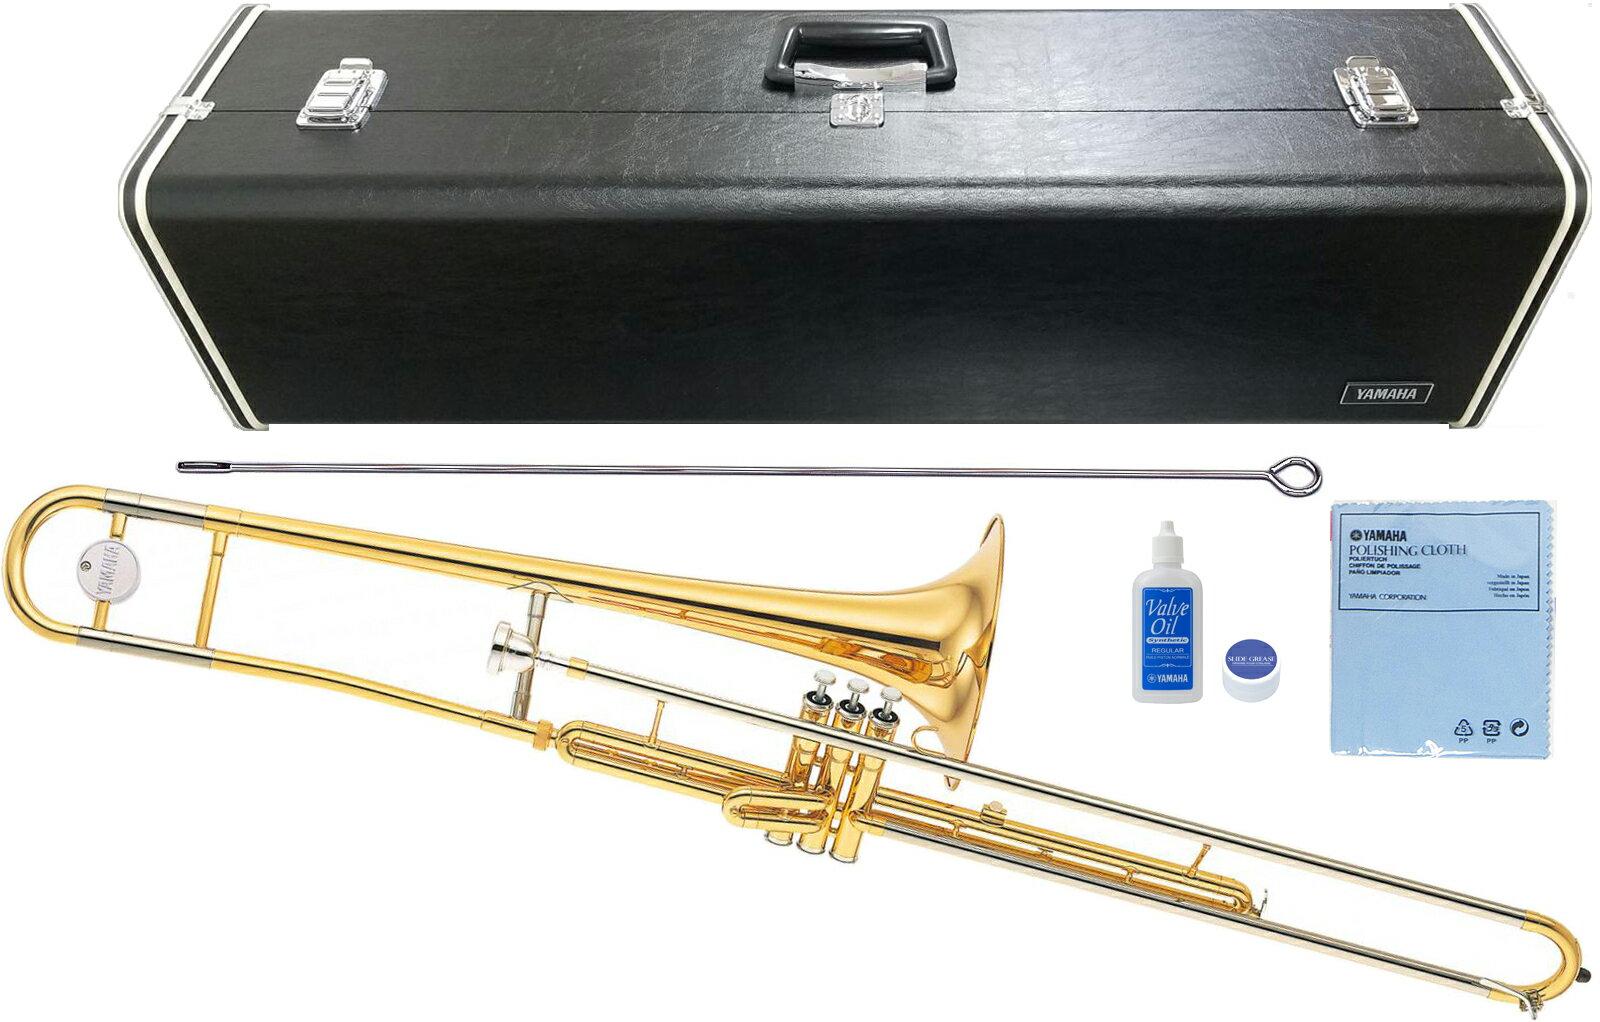 YAMAHA ( ヤマハ ) YSL-354V ピストン式 バルブトロンボーン ゴールド 新品 トロンボーン B♭管 細管 楽器 本体 マーチング 日本製 管楽器 送料無料